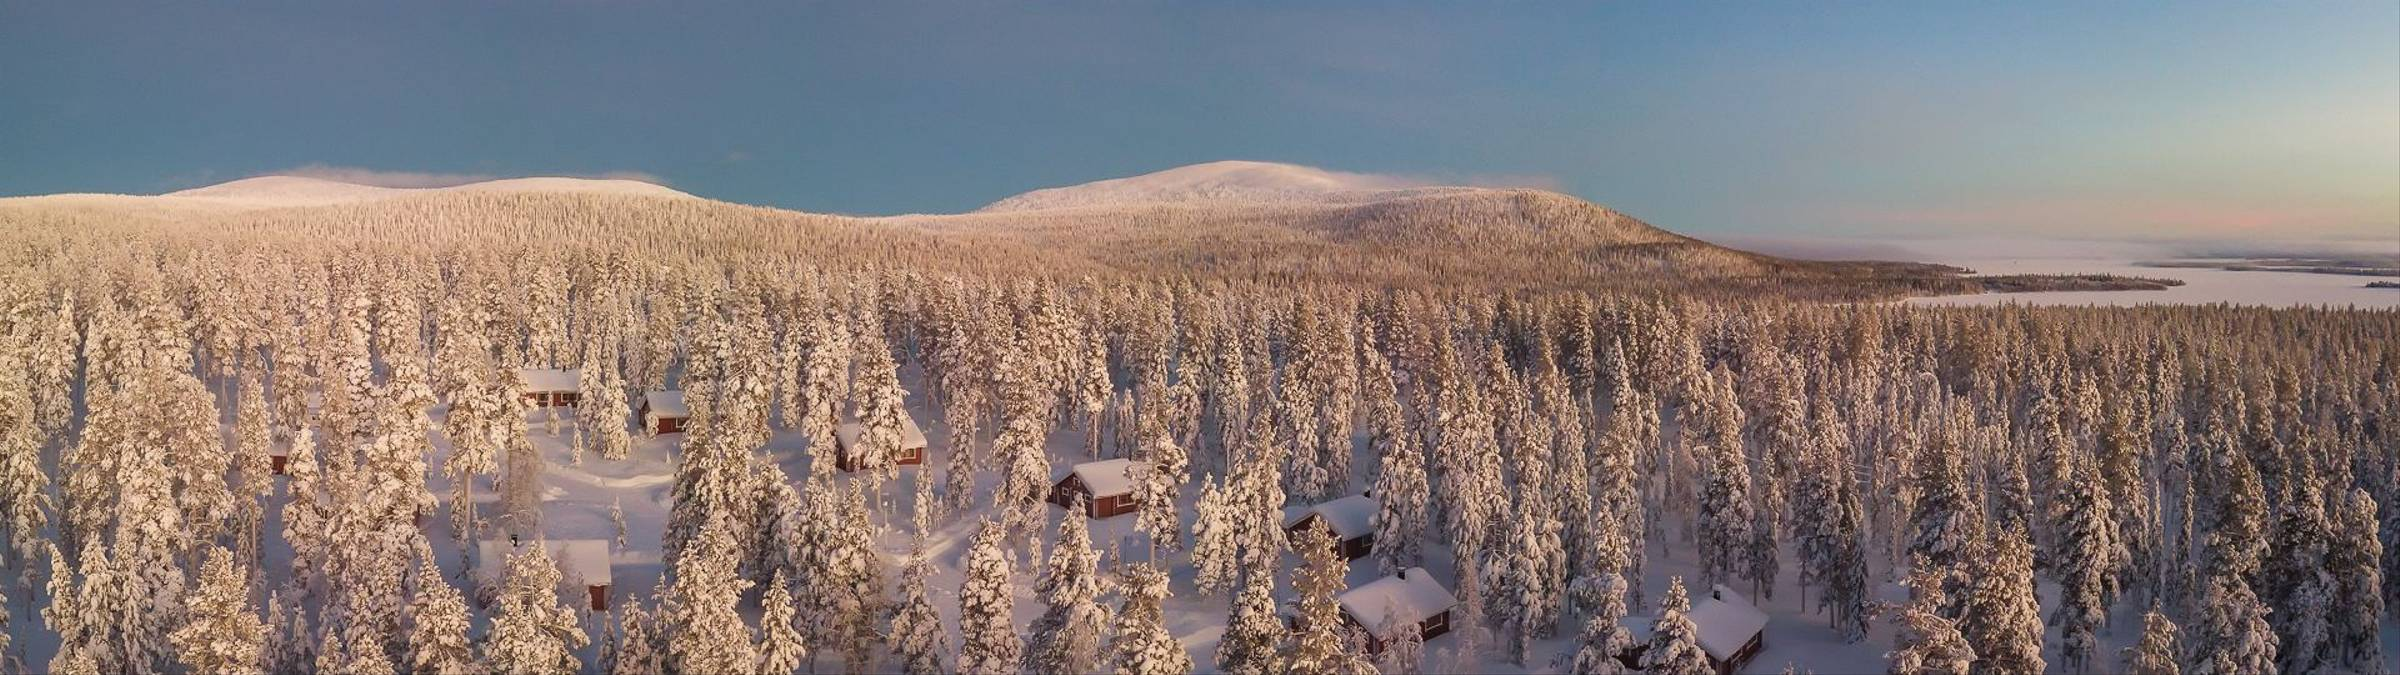 Hotel Jeris Aerial Web 4   Antti Pietikainen